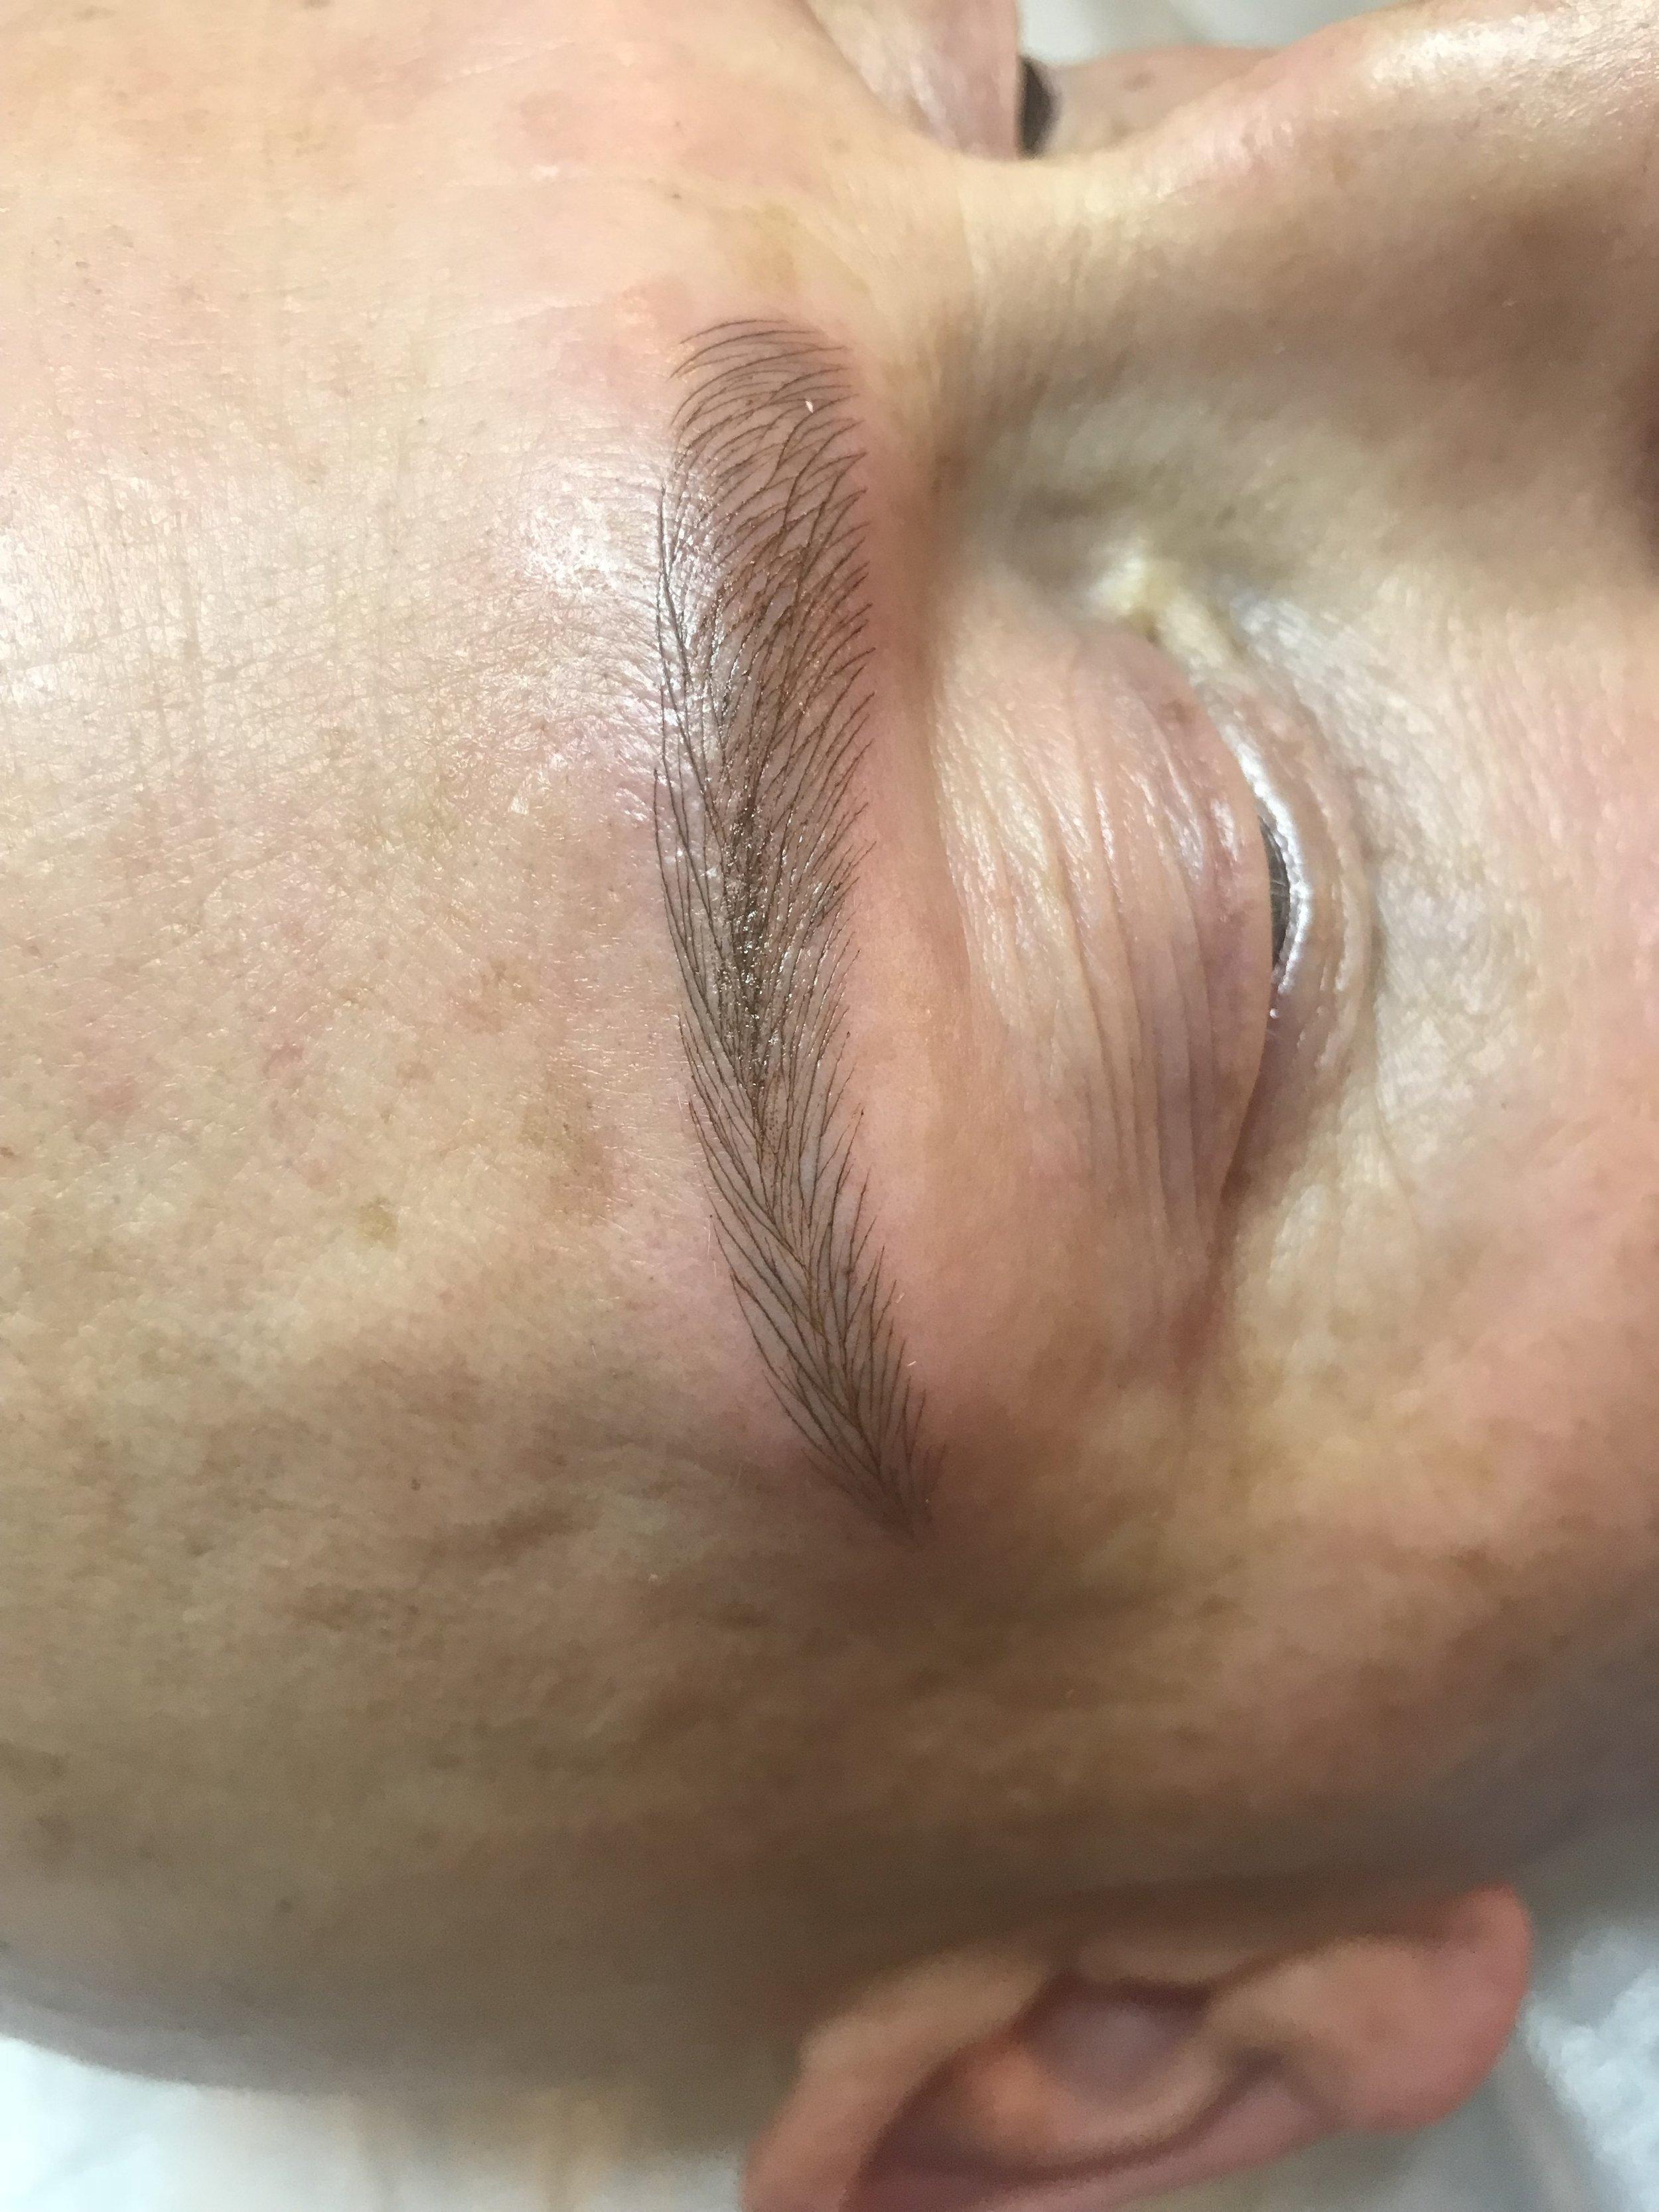 Alopecia/Microblading after